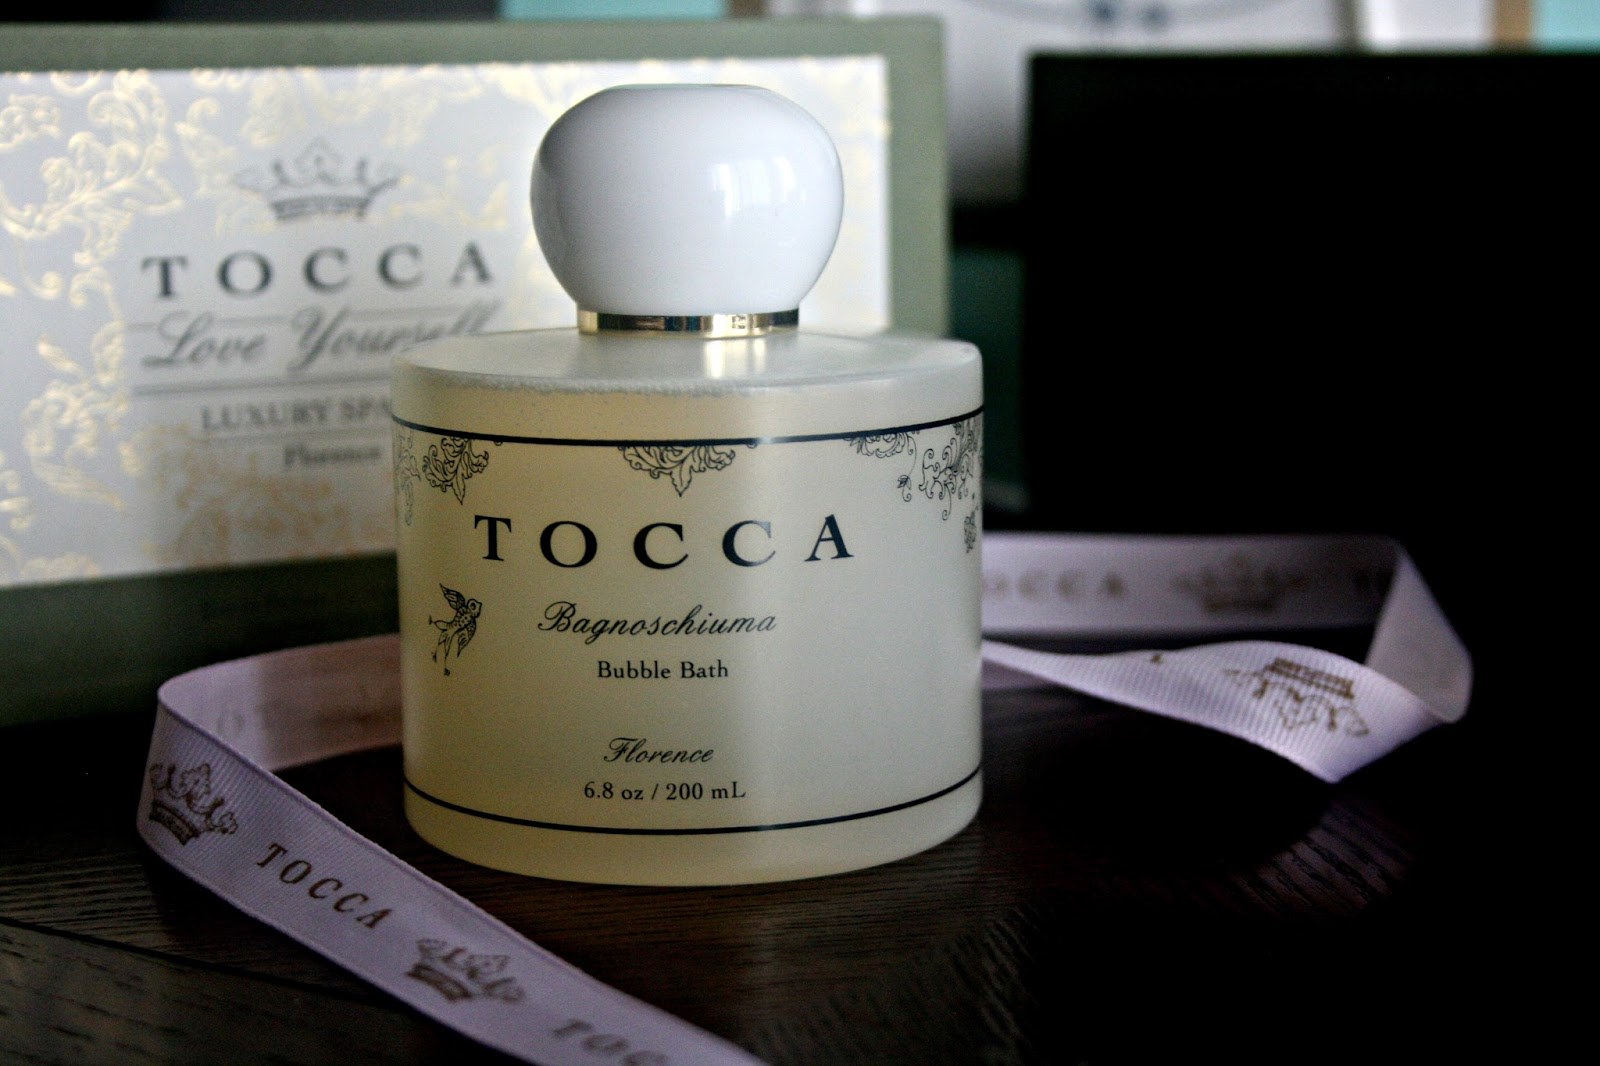 Le parfum the perfume - 2 10